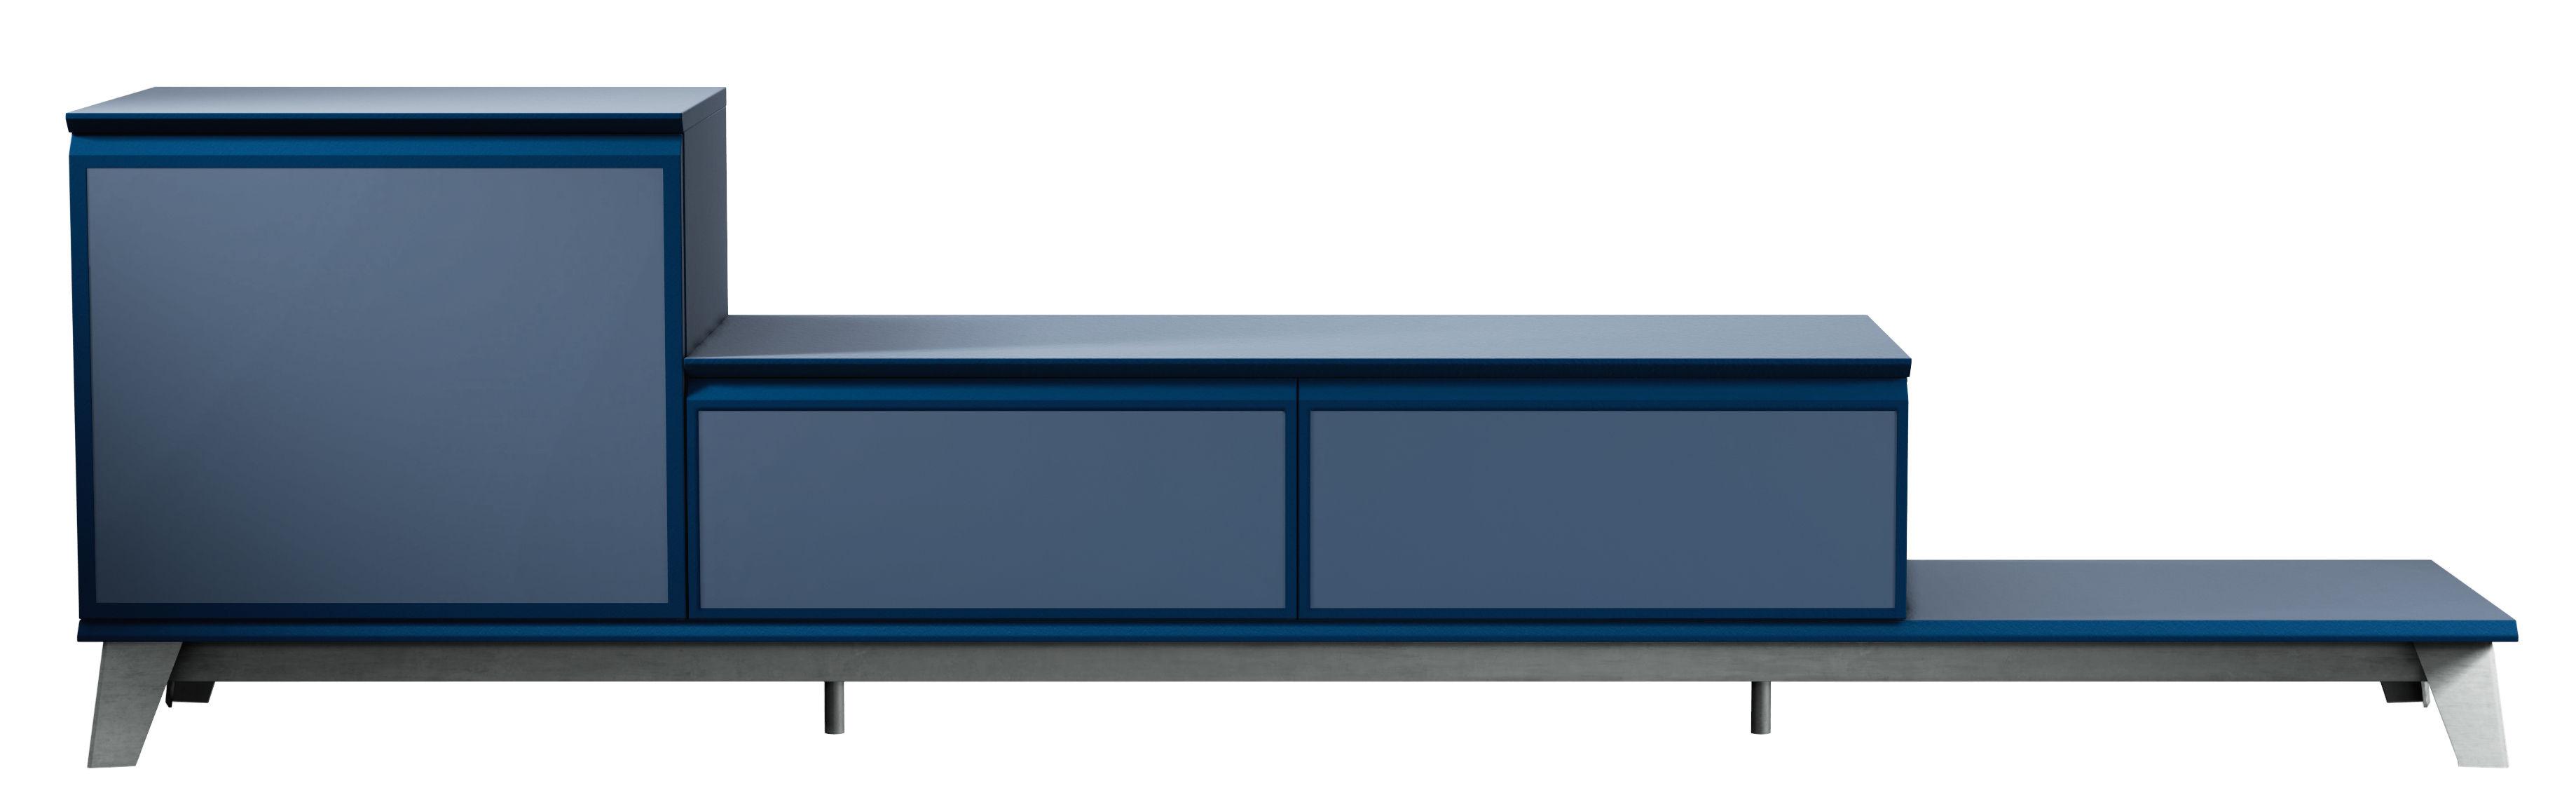 Buffet Voltaire  Meuble TV  L 240 cm Bleu  Diesel with Moroso -> Meuble Tv Bleu